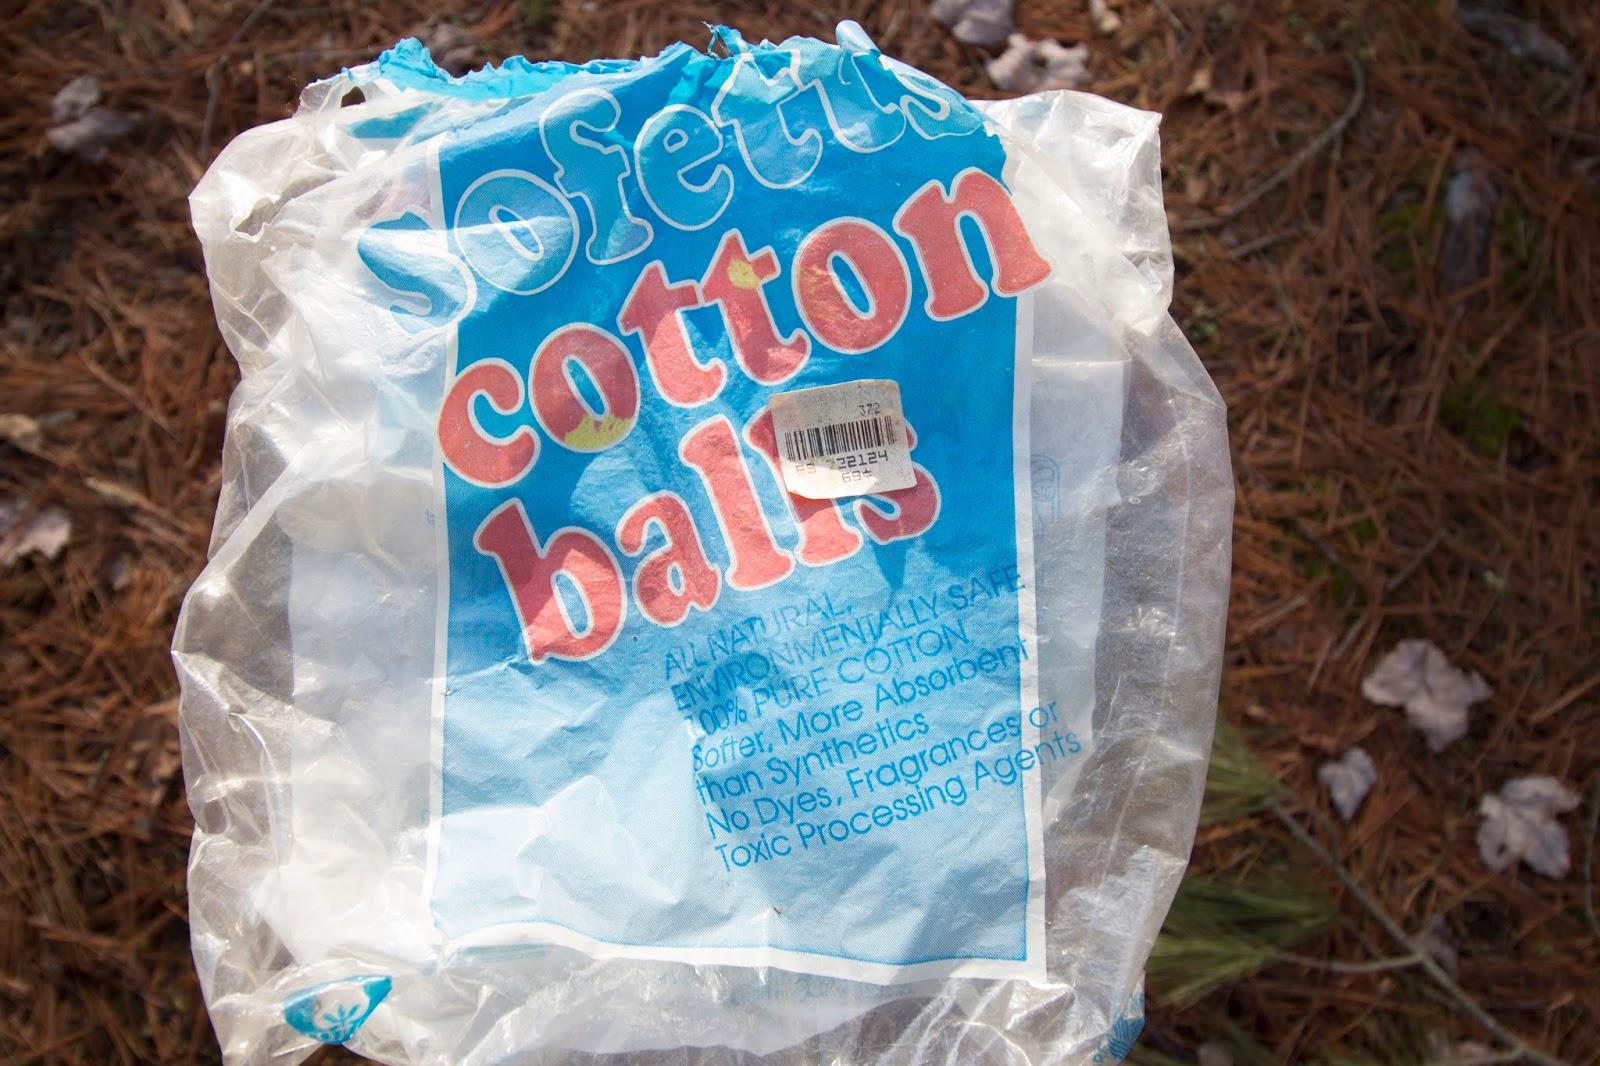 100% Cotton Balls